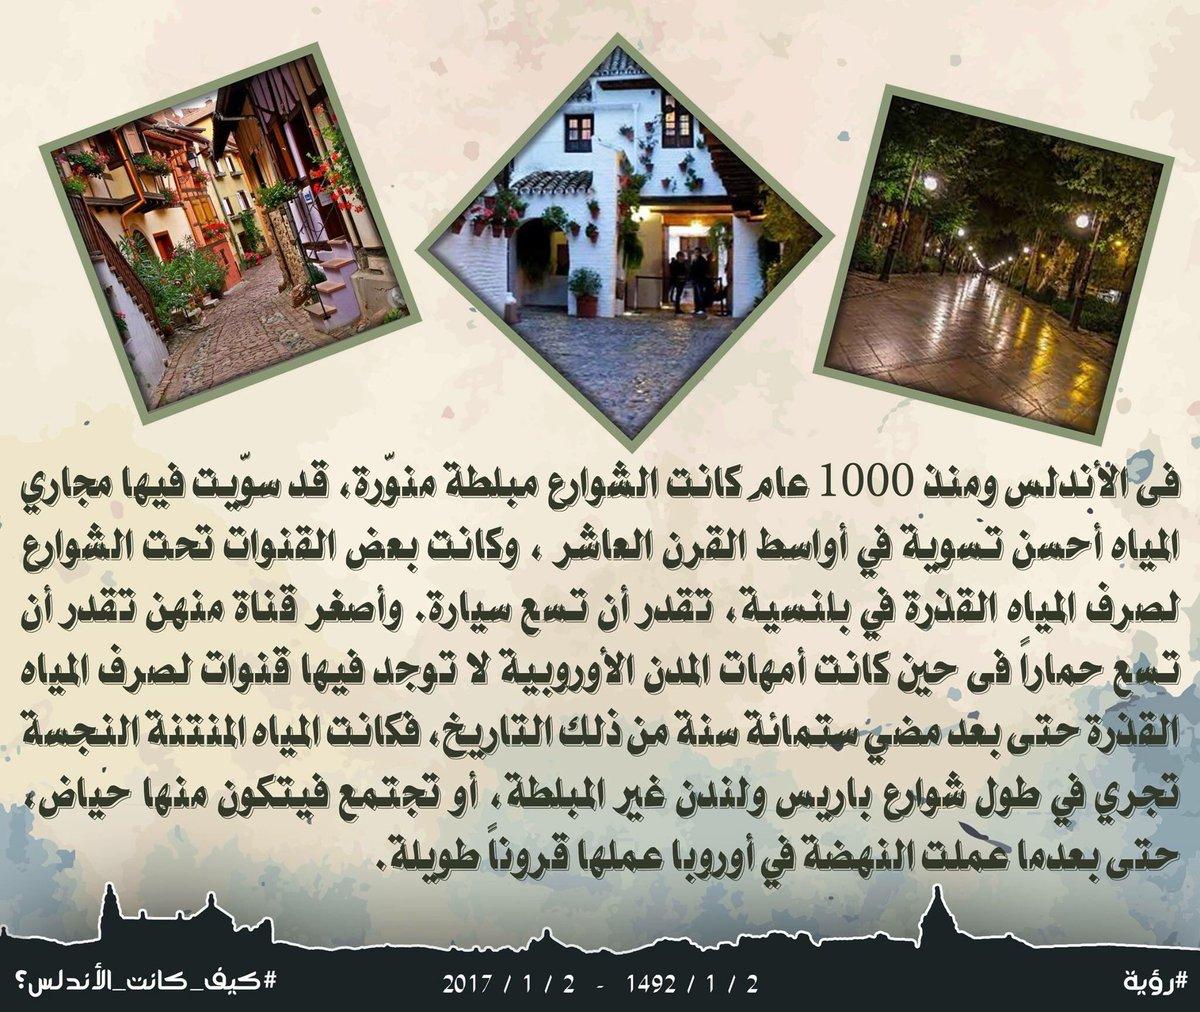 RT @andalucian711: #فريق_رؤية #كيف_كانت_الأندلس #ذكرى_سقوط_الأندلس  #النكبة_الأندلسية...